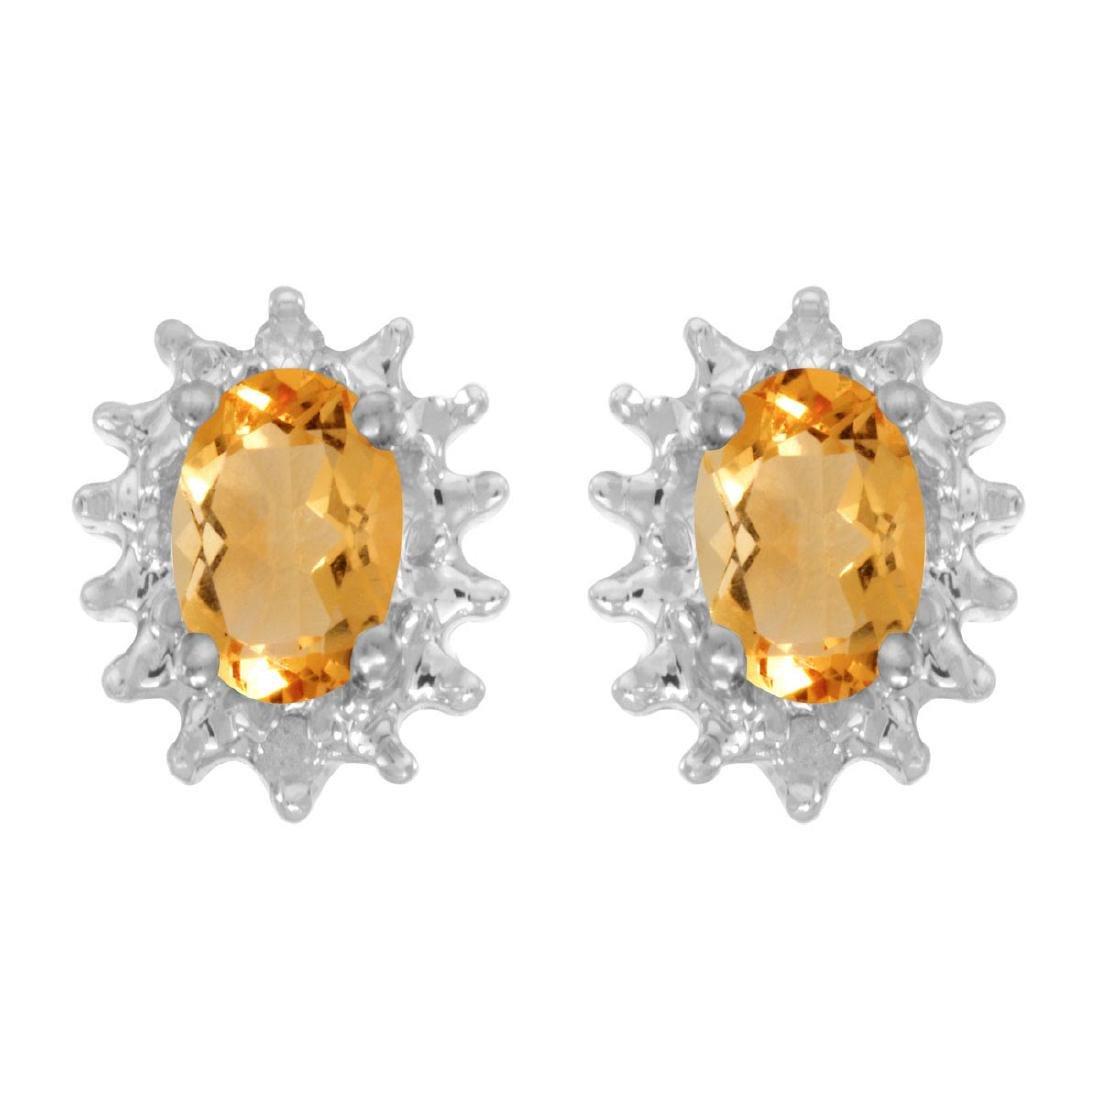 Certified 14k White Gold Oval Citrine And Diamond Earri